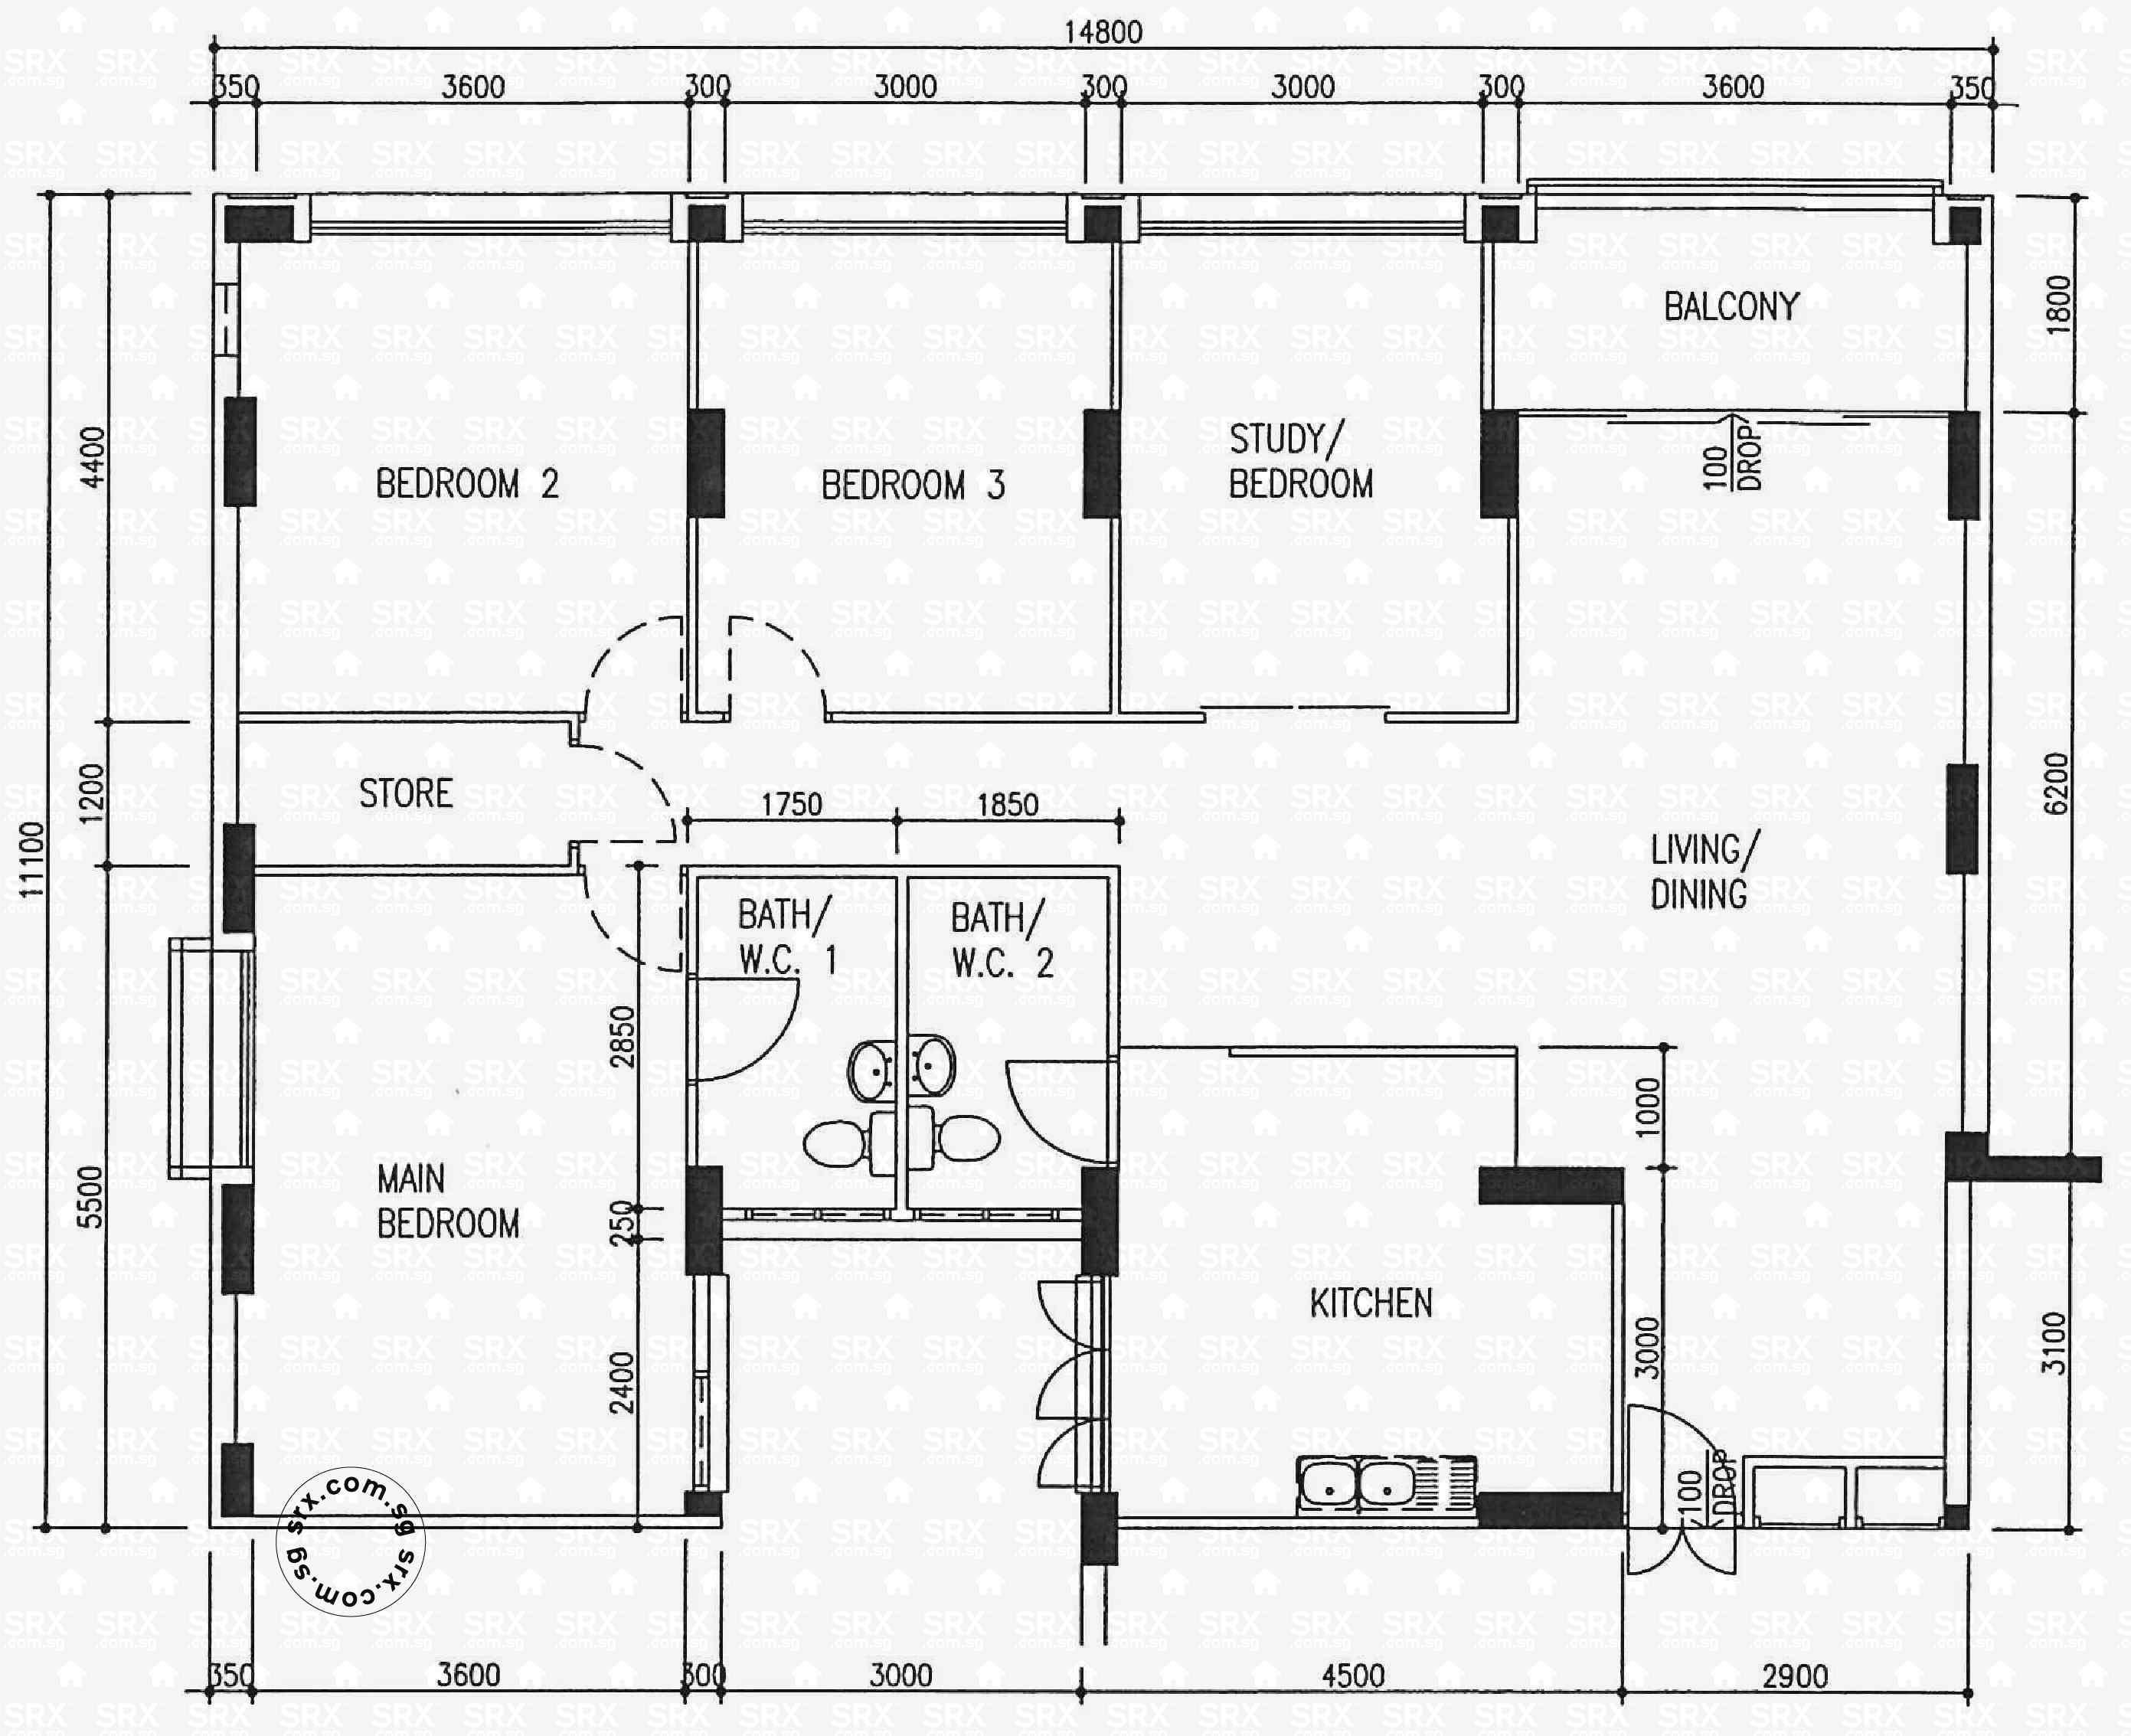 Pasir ris drive 1 hdb details srx property for 509 plans